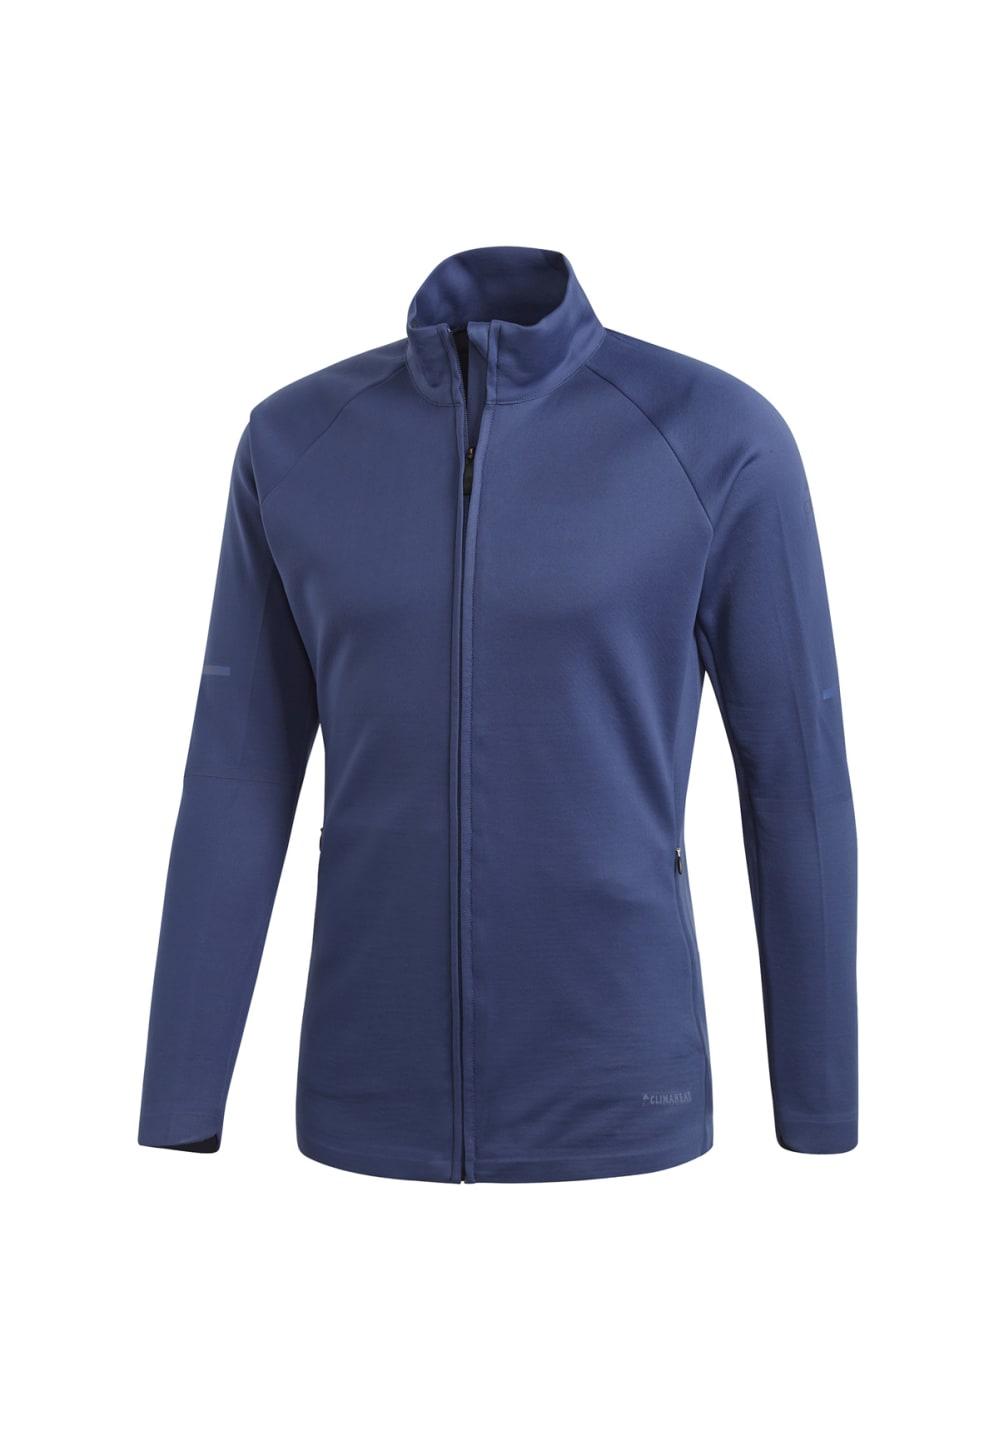 Adidas Hybrid Jacket Primeknit Men Running De Climaheat Chaquetas a6Prwa